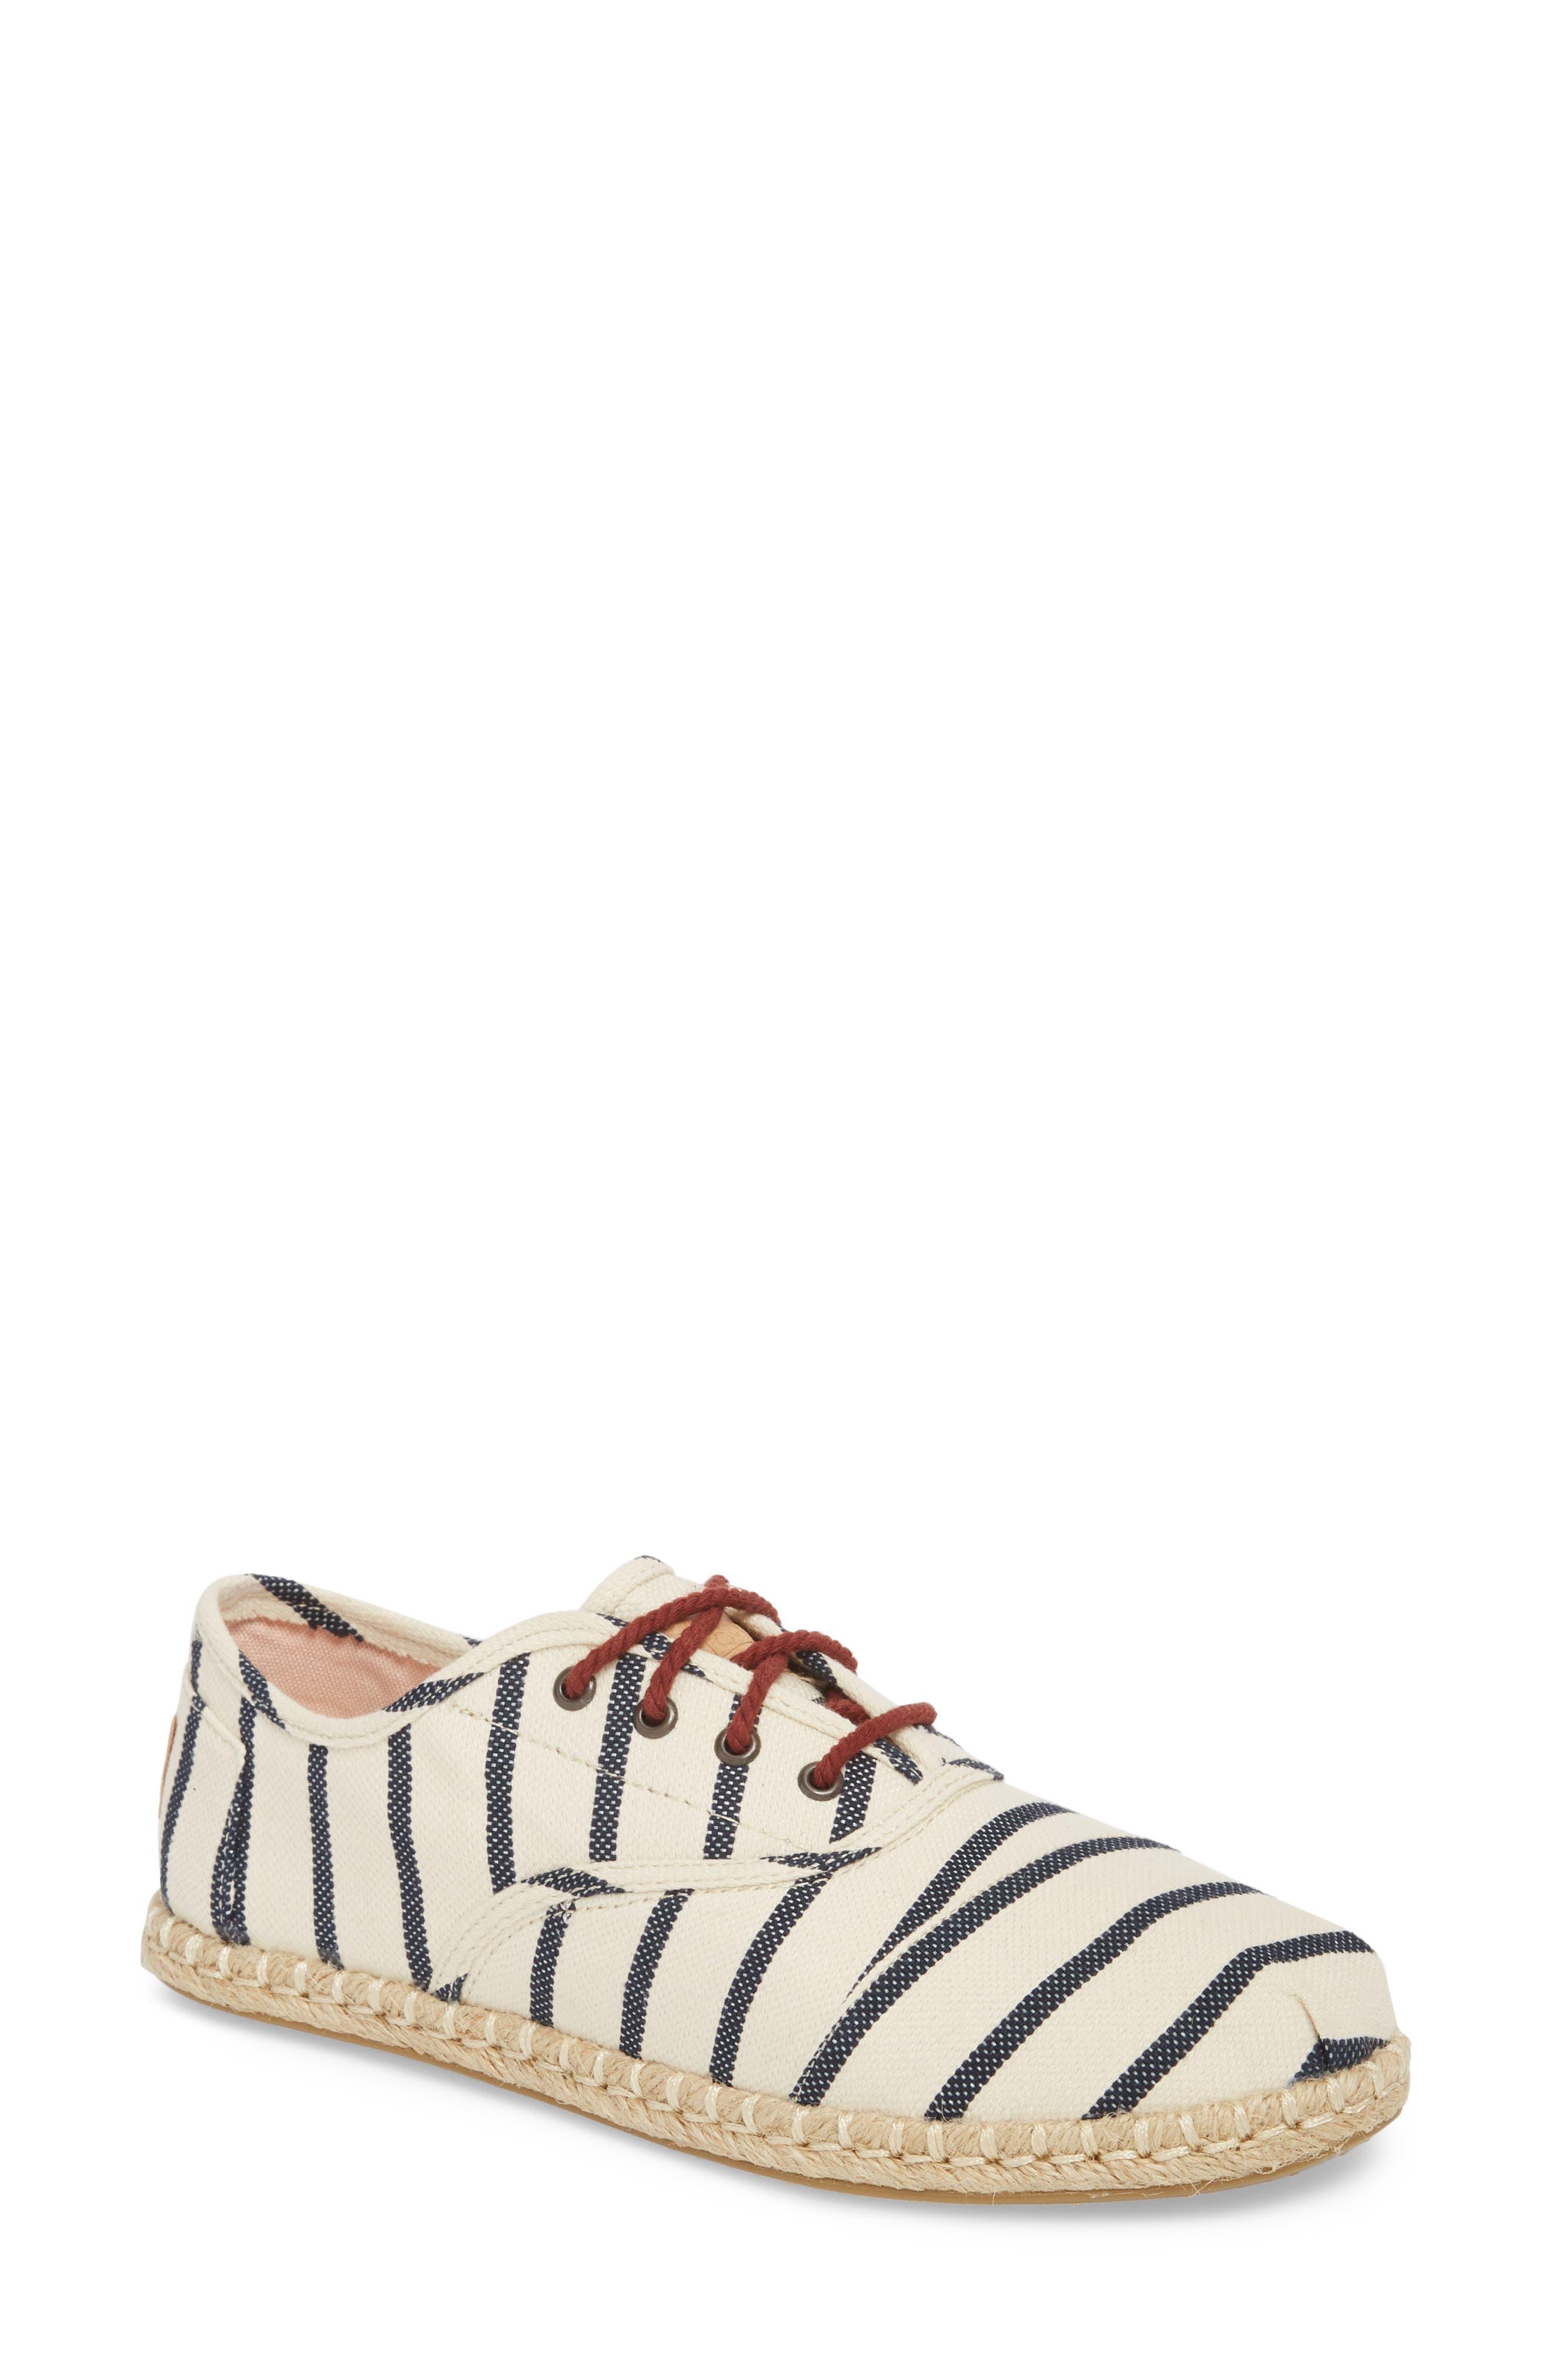 Cordones Sneaker,                         Main,                         color, Natural Stripe Woven